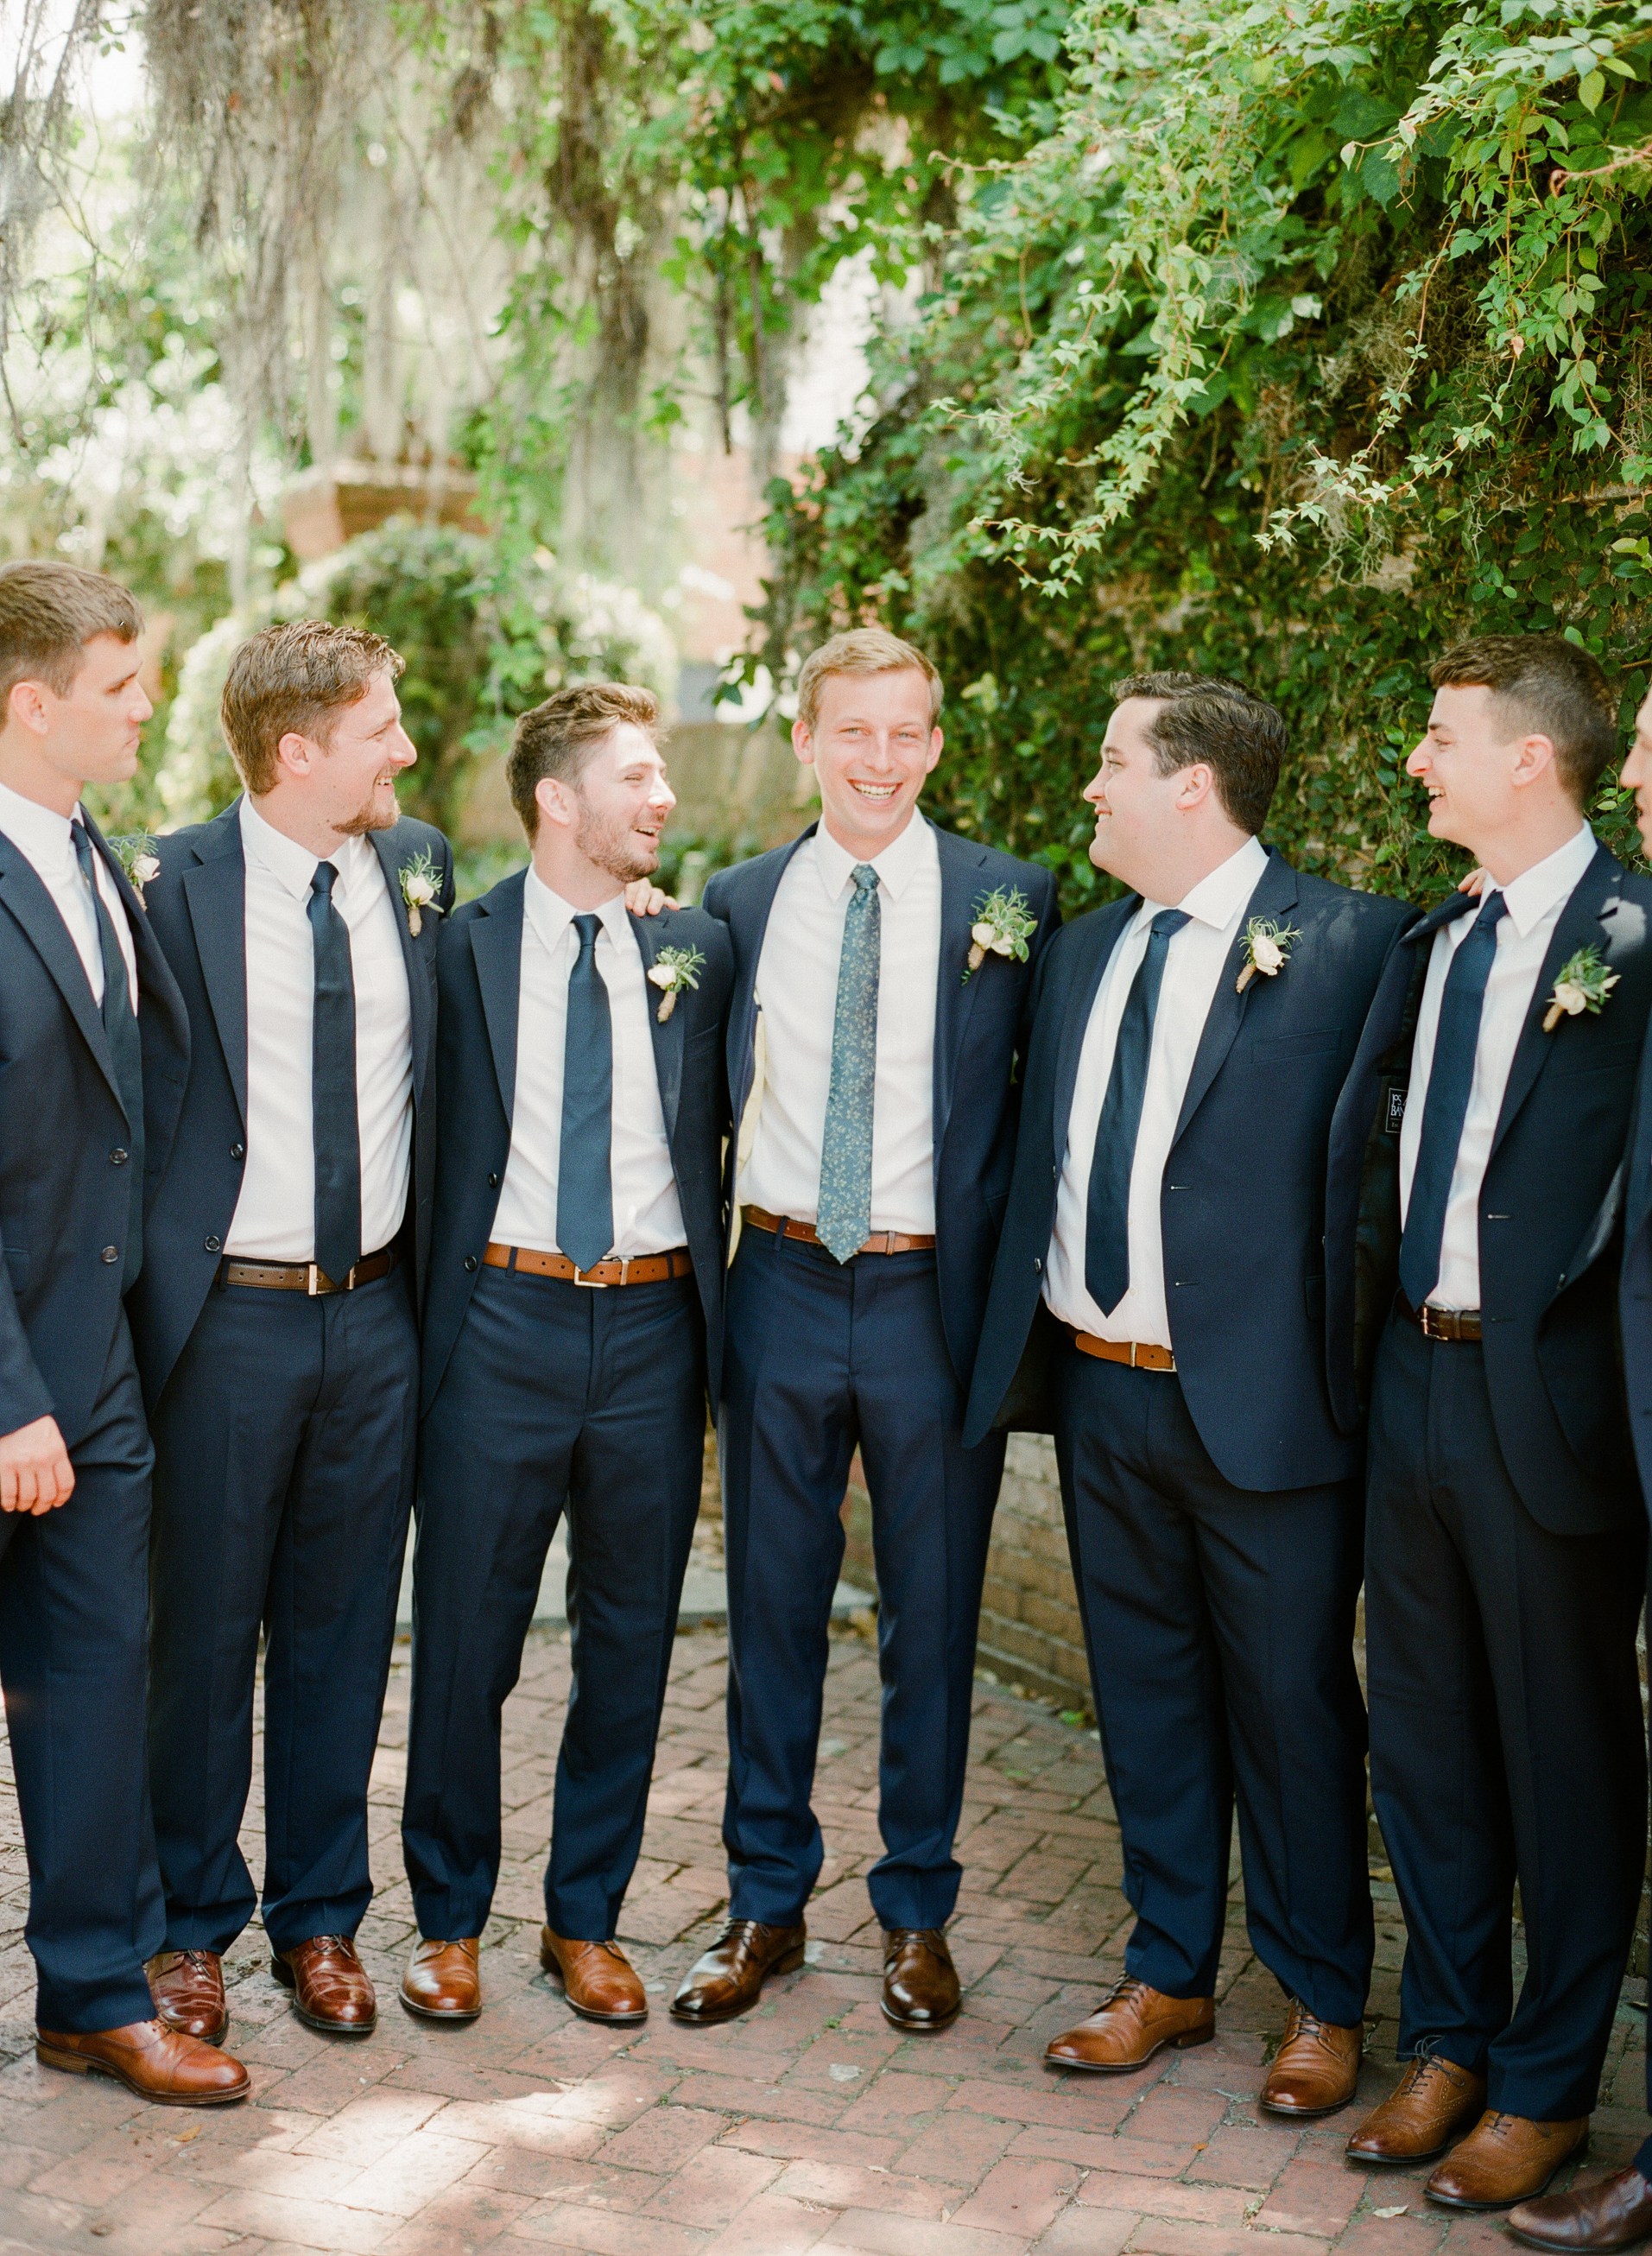 Savannah-Wedding-Photos-Florals.jpg